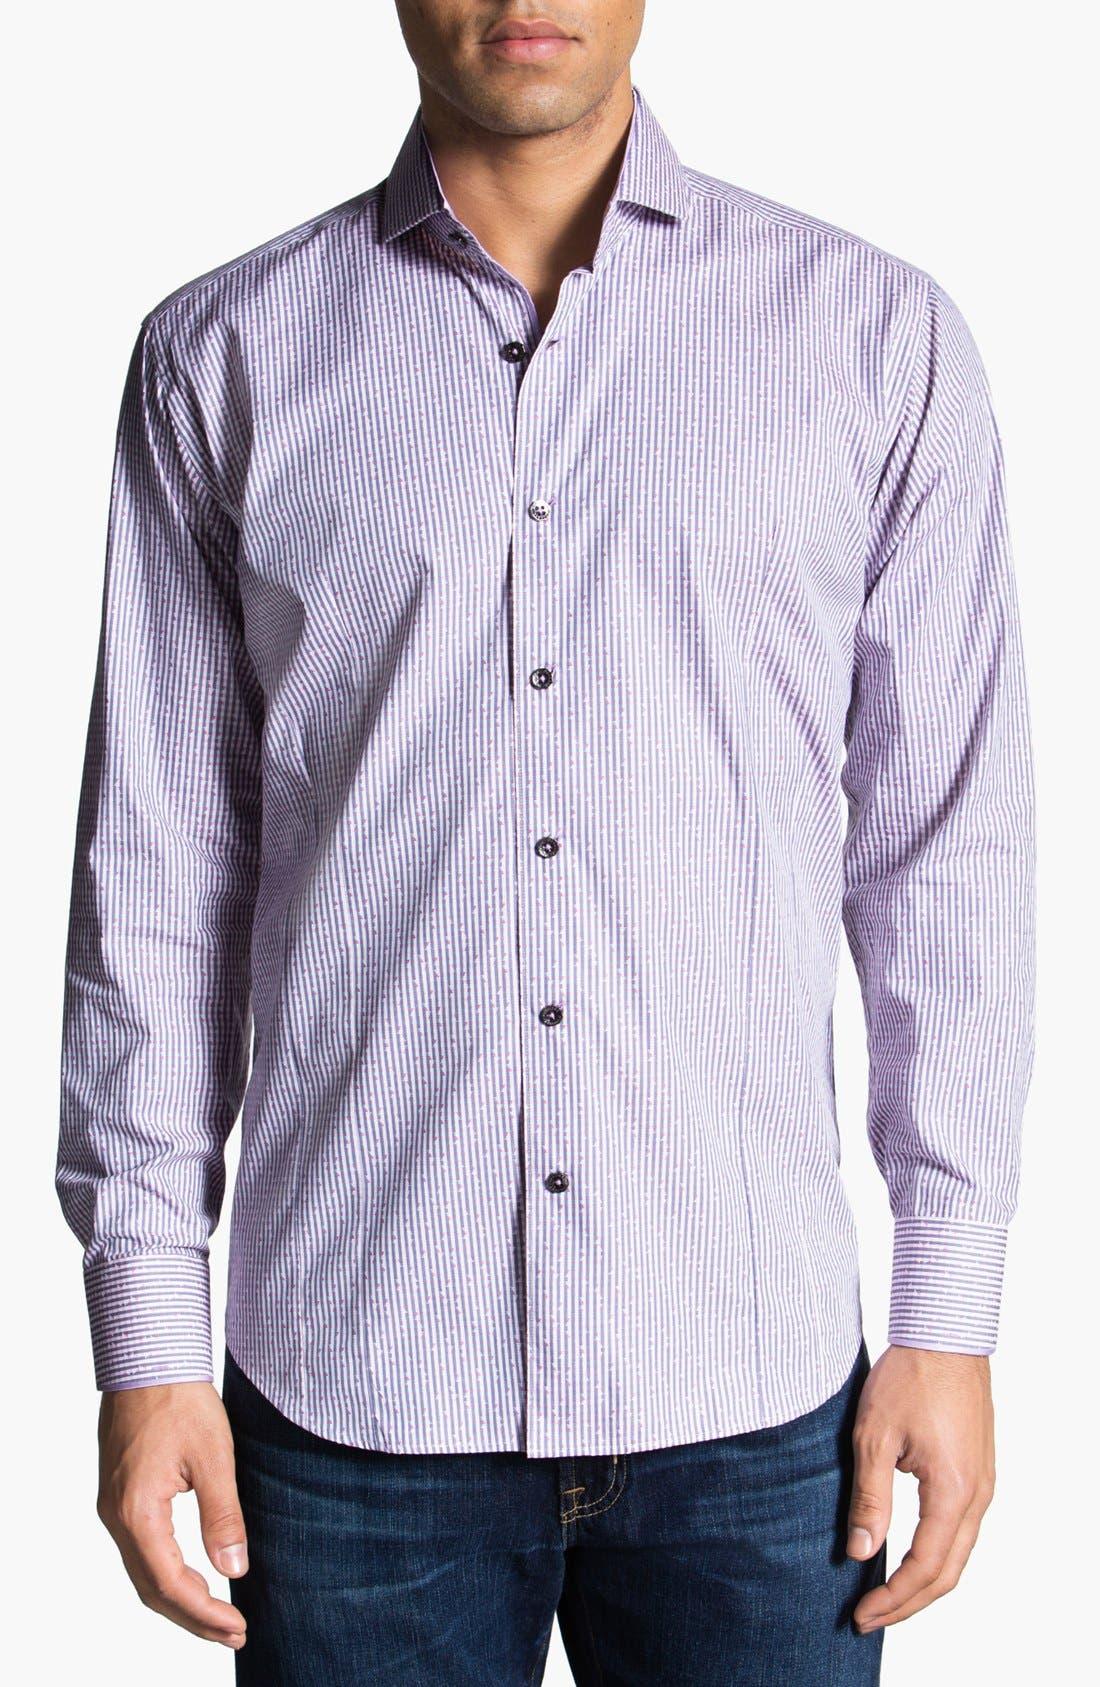 Alternate Image 1 Selected - Bogosse 'Giorgio' Sport Shirt